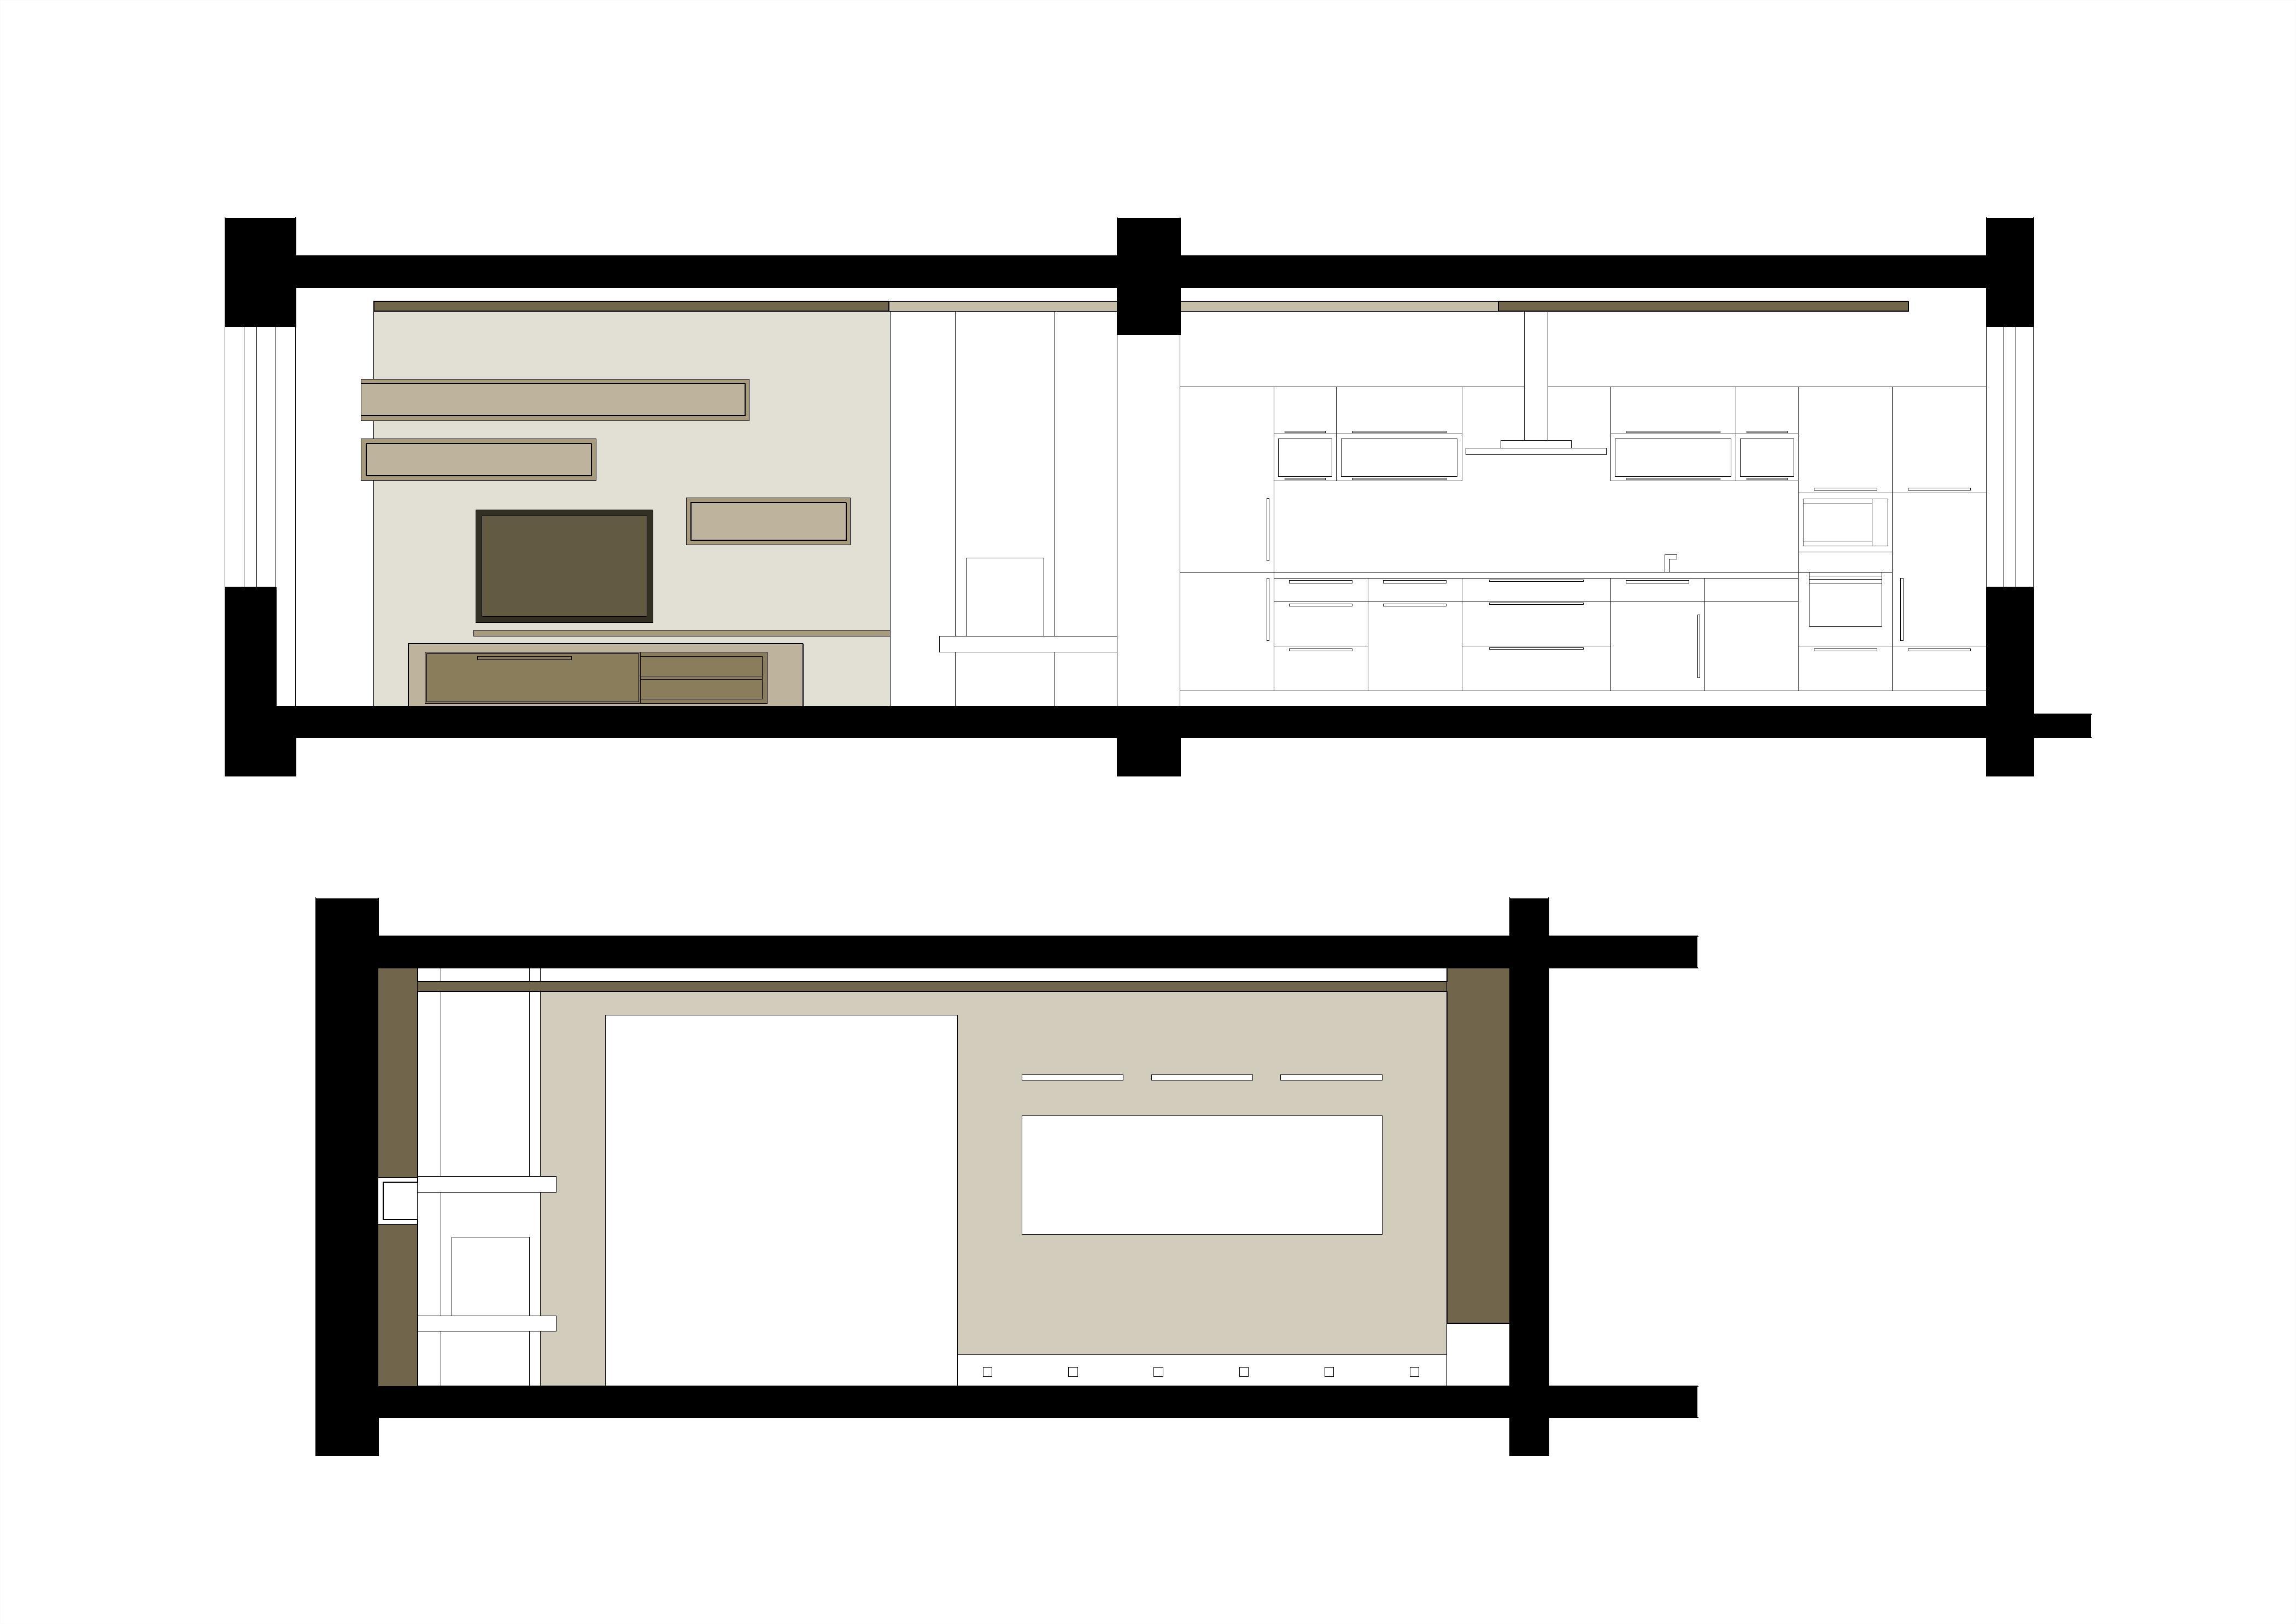 Projekt interiéru RD I 10